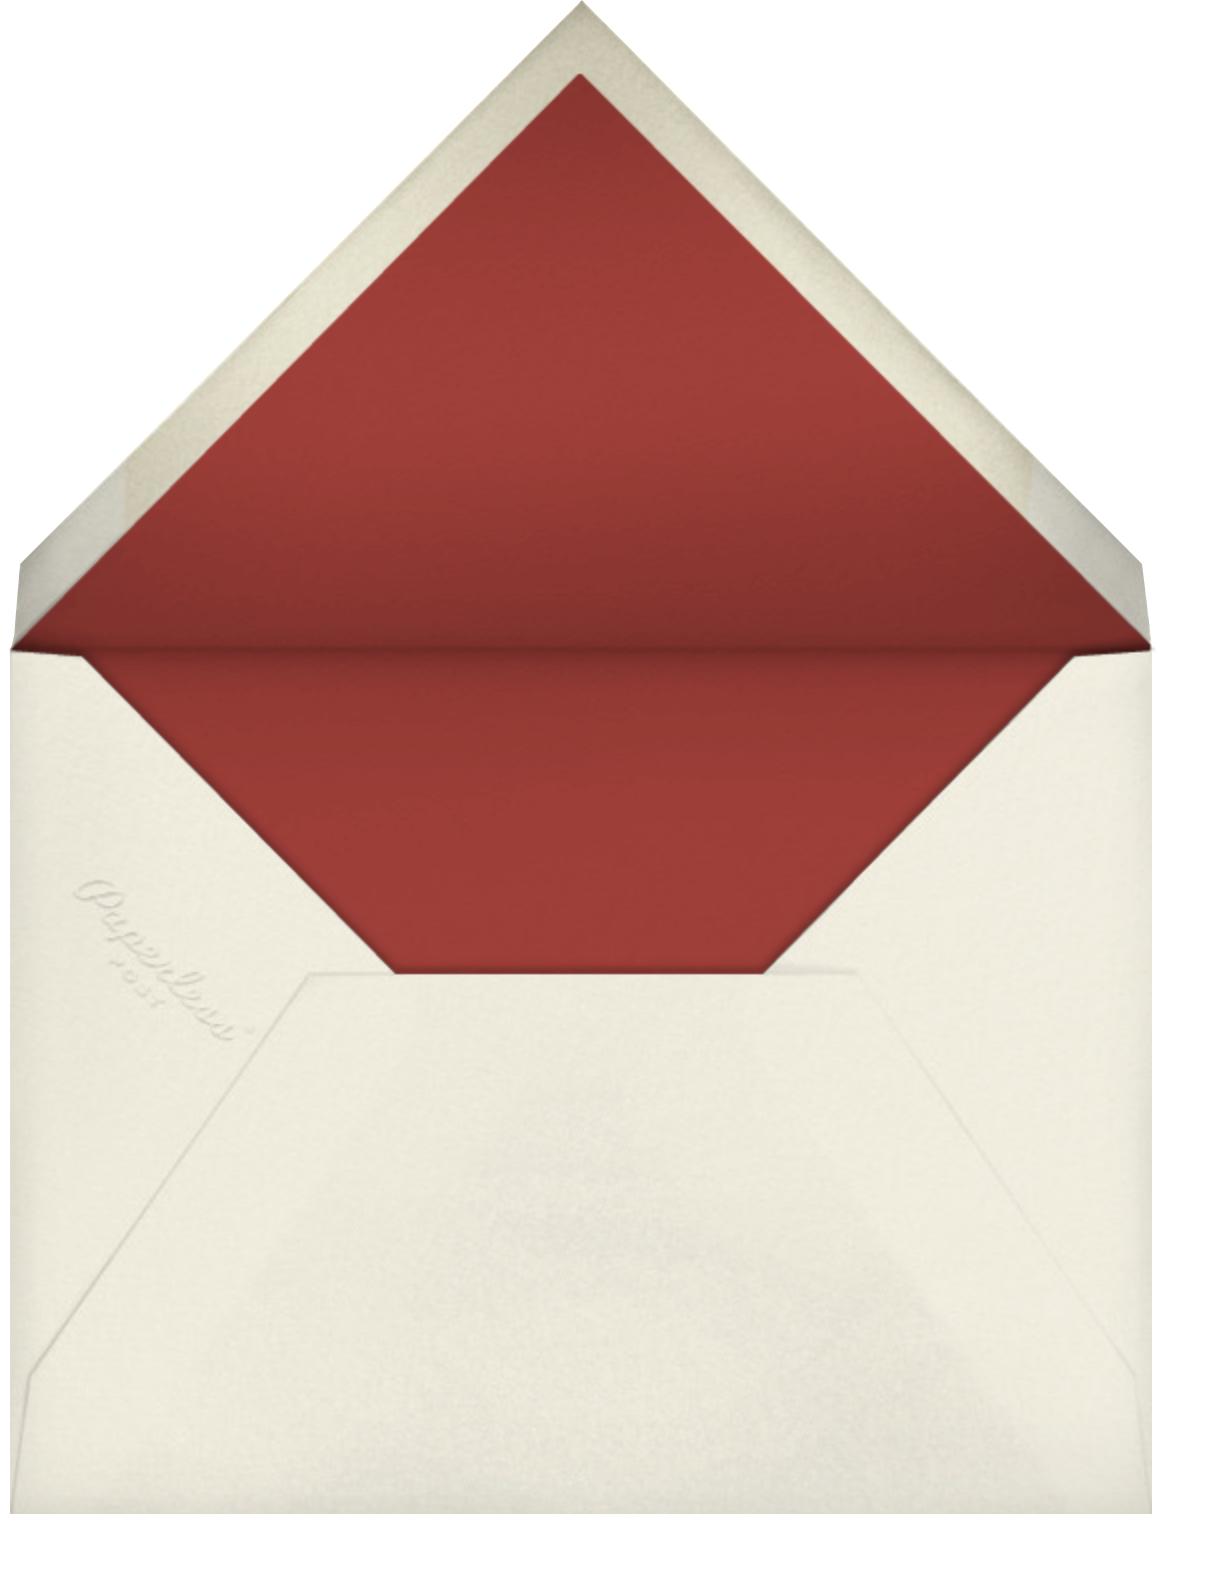 Botanist - Oscar de la Renta - Autumn entertaining - envelope back